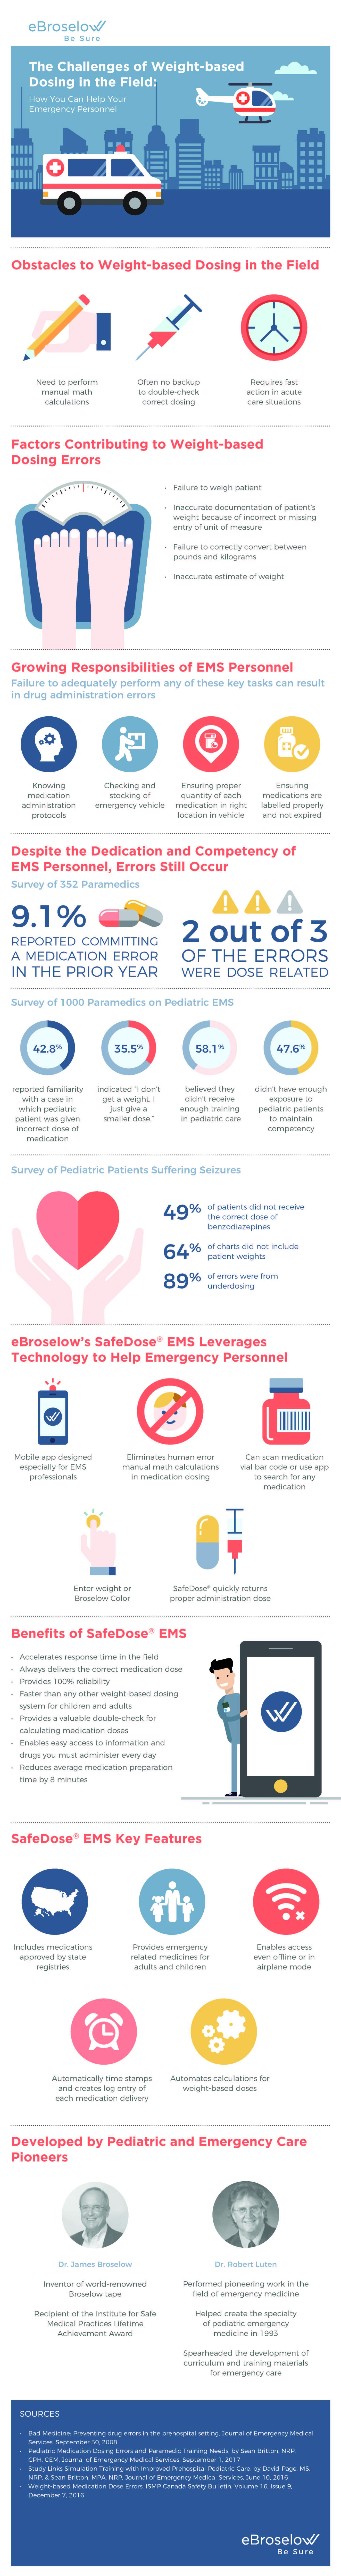 eBroselow - infographic